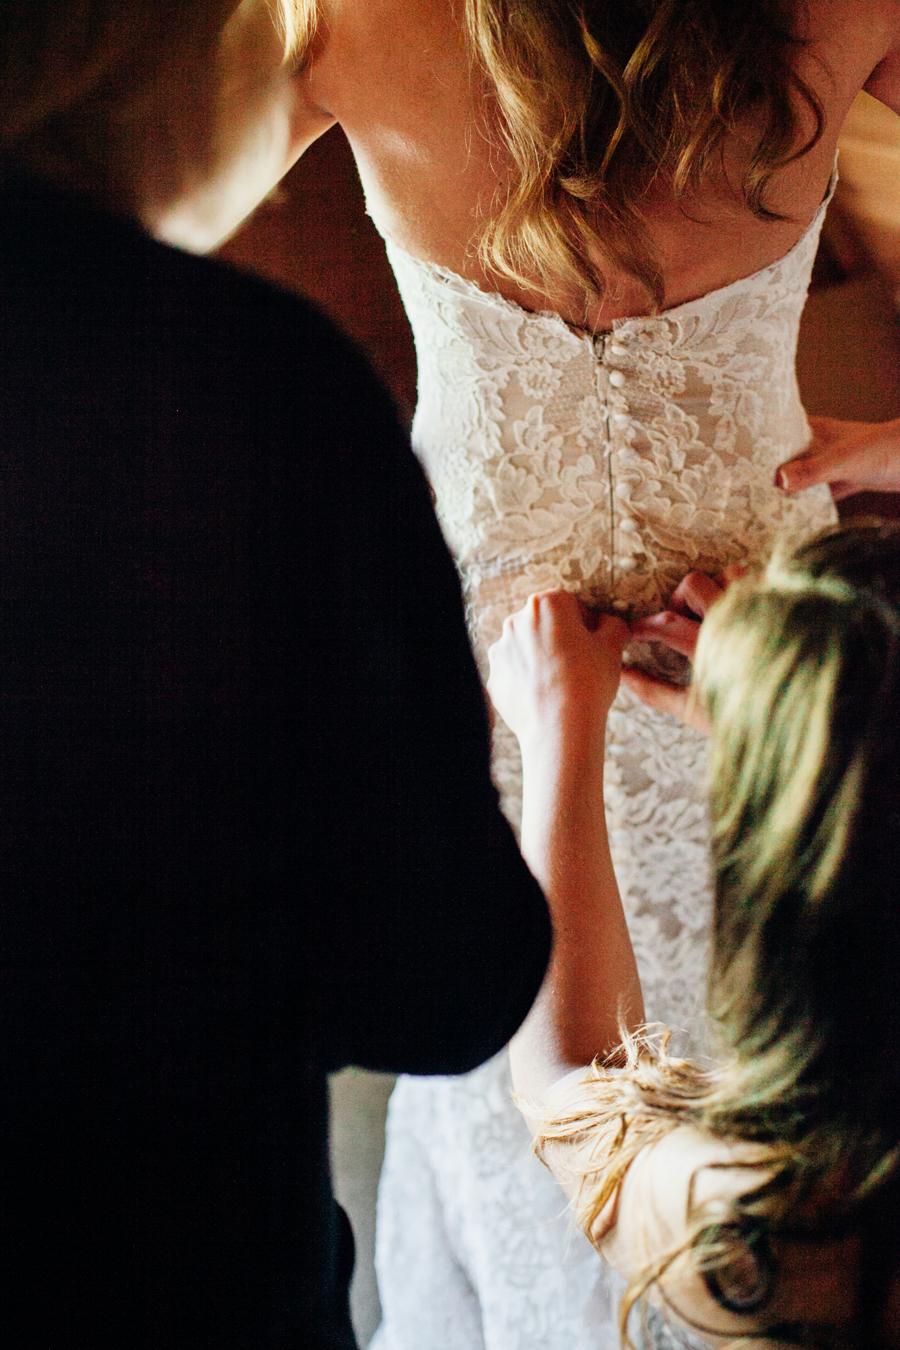 010-seattle-bothell-wedding-photographer-russells-restaurant-wilkins-photo.jpg